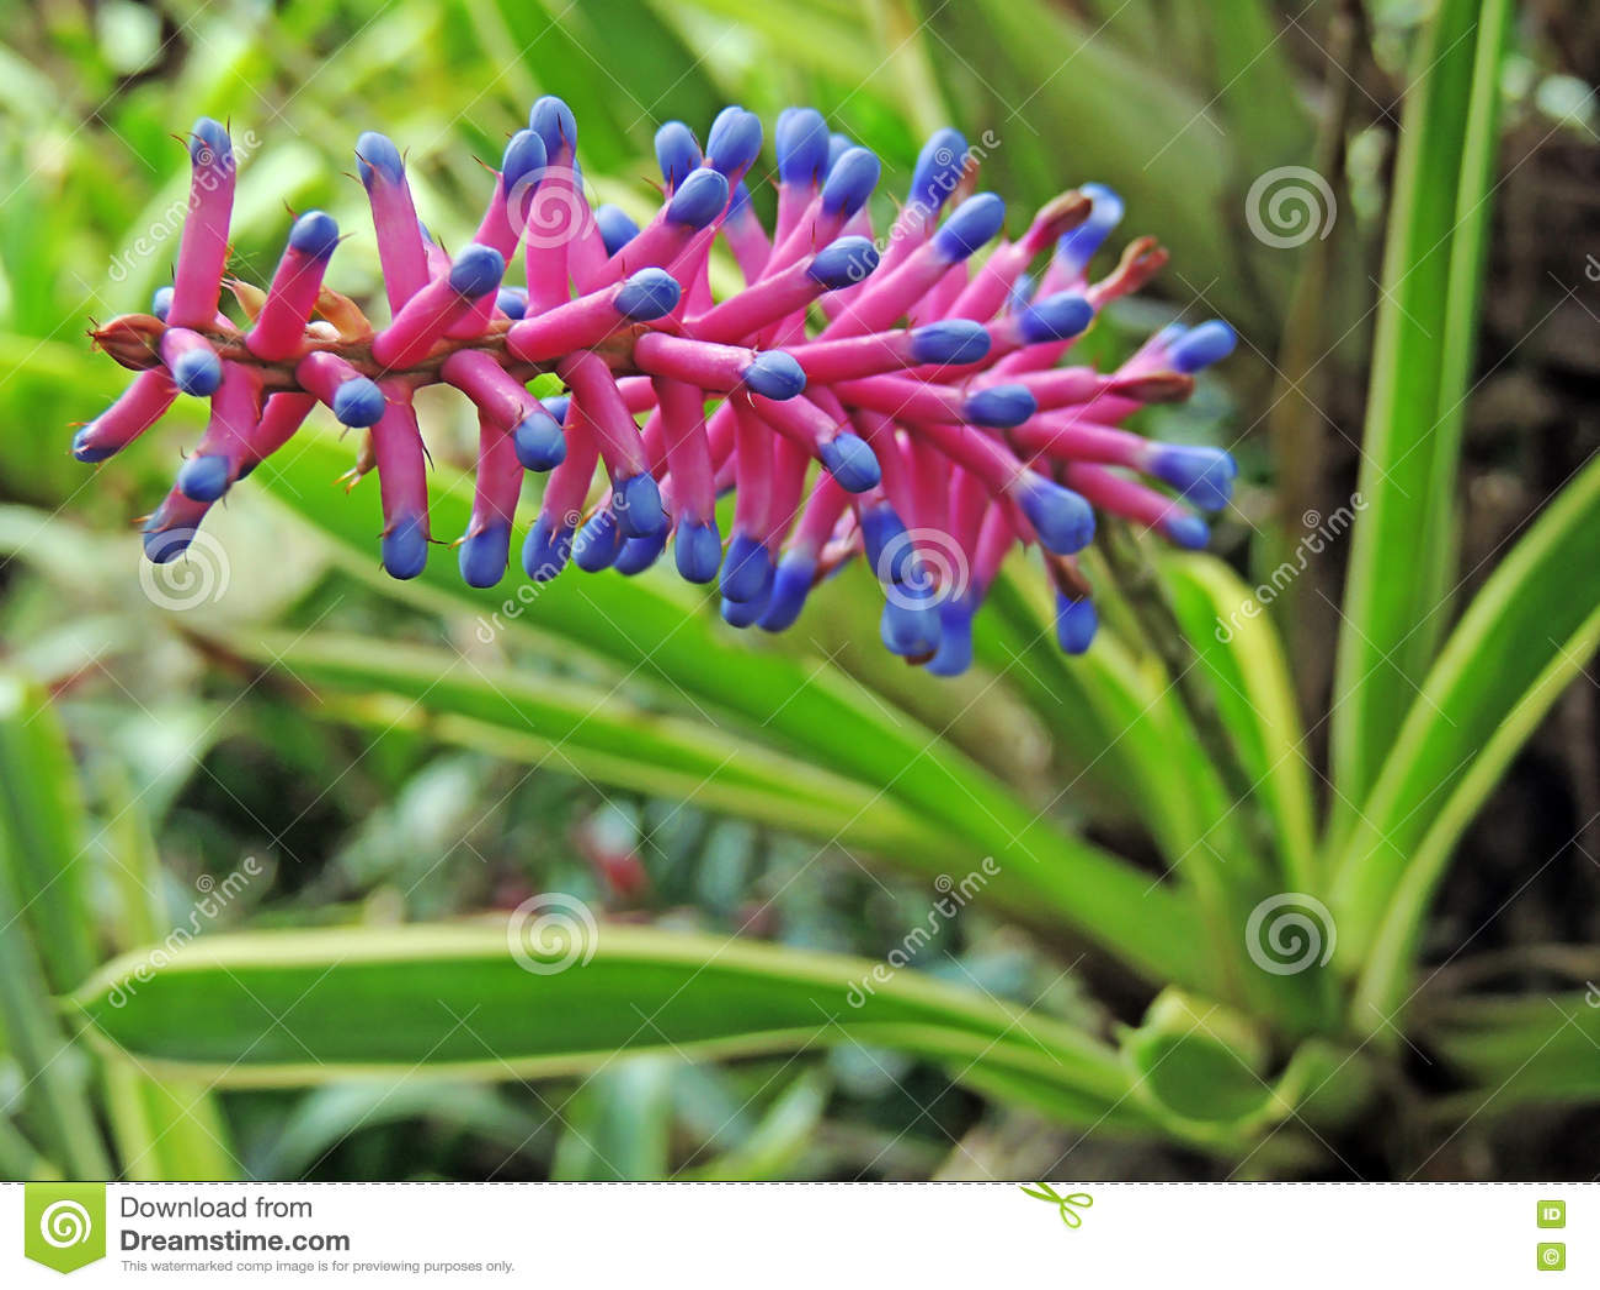 Bromeliad Flower Pink Aechmea Apocalyptica Gamesopela Blue Stock